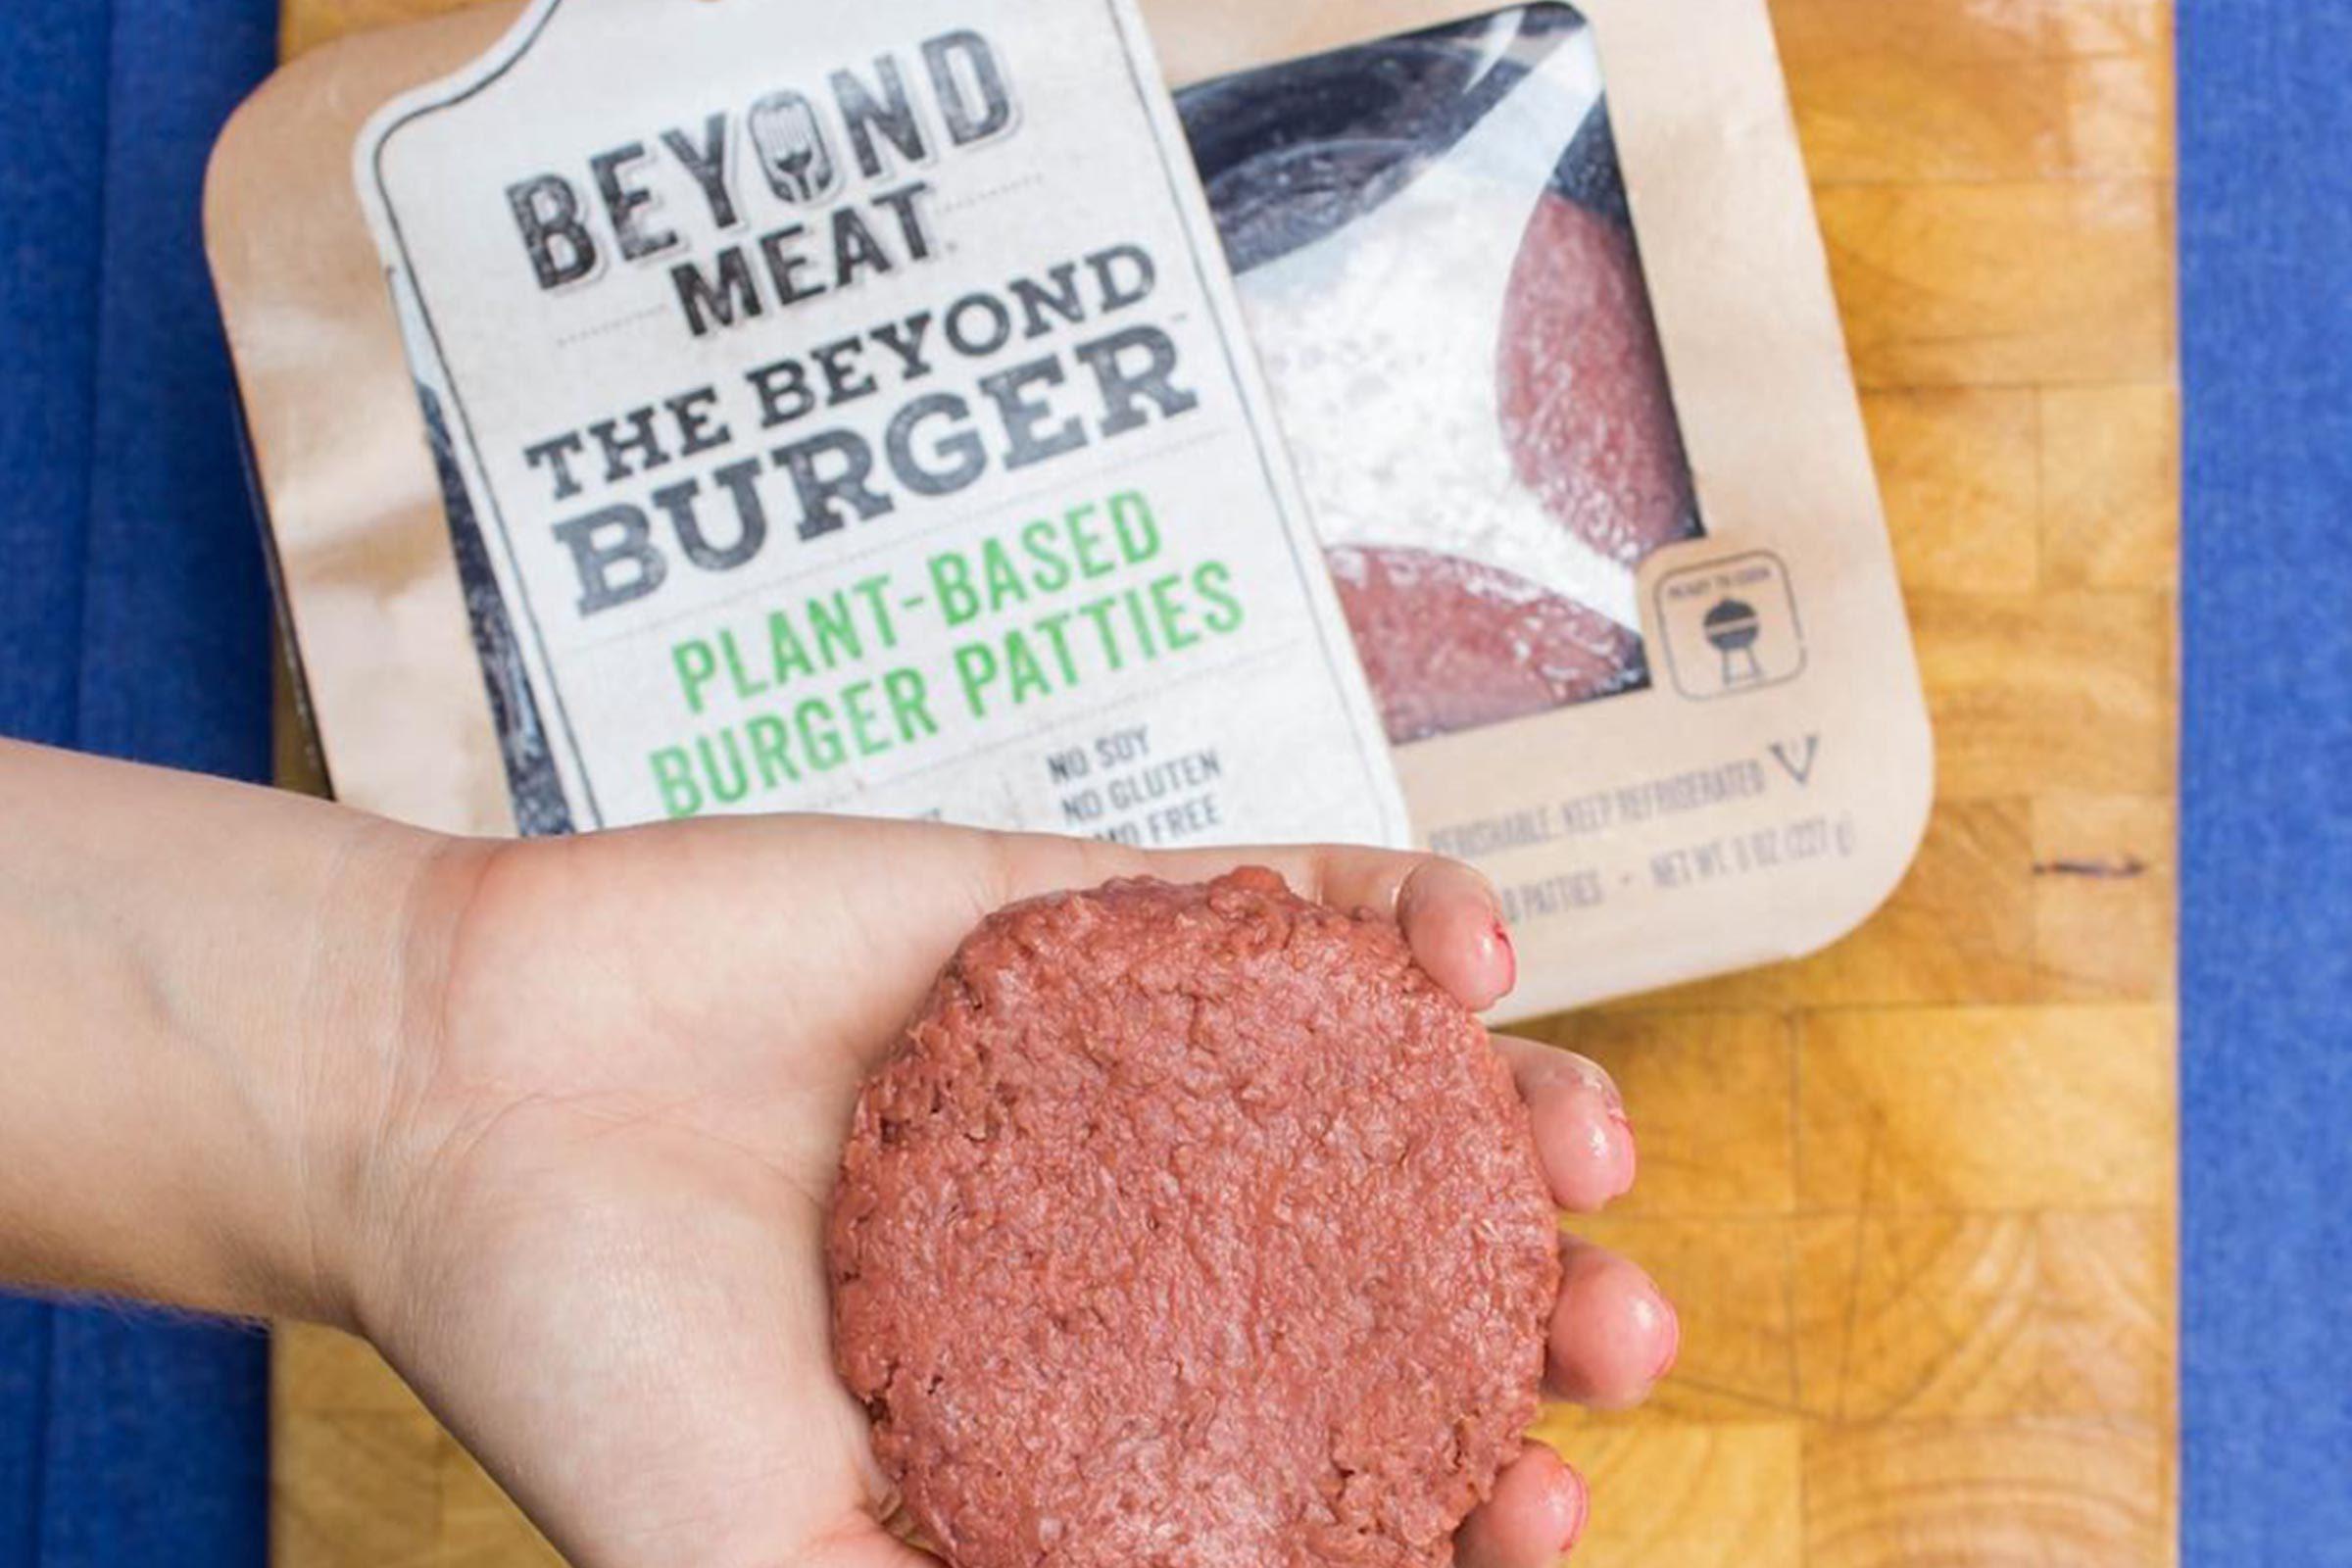 Vegan burger patties